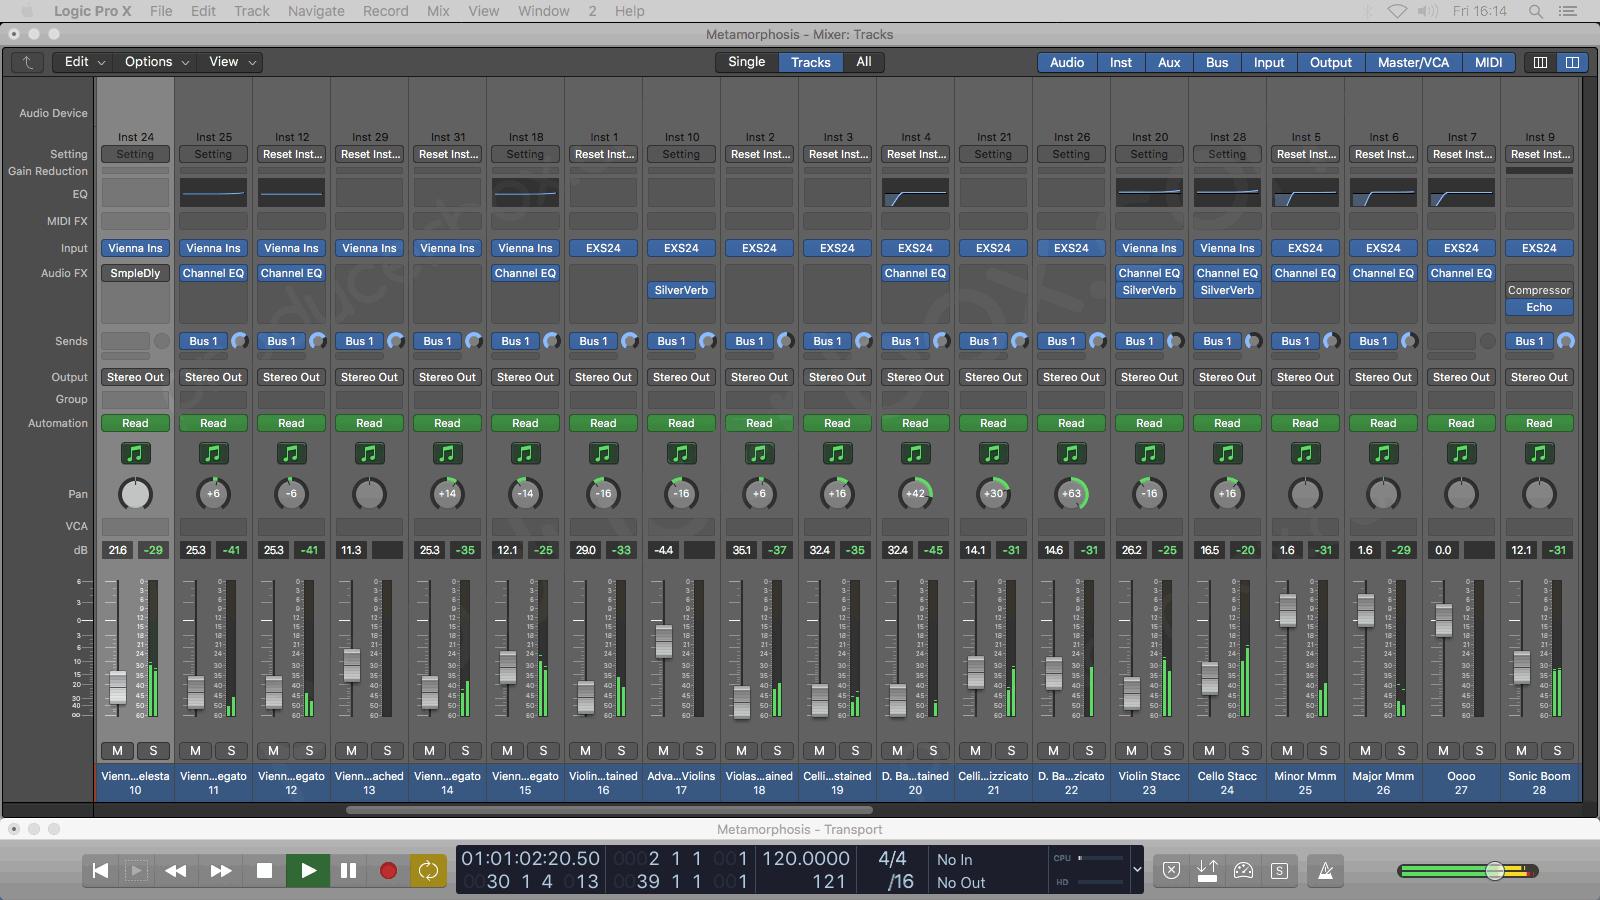 Metamorphosis - Logic Pro X Template by TrackSonix